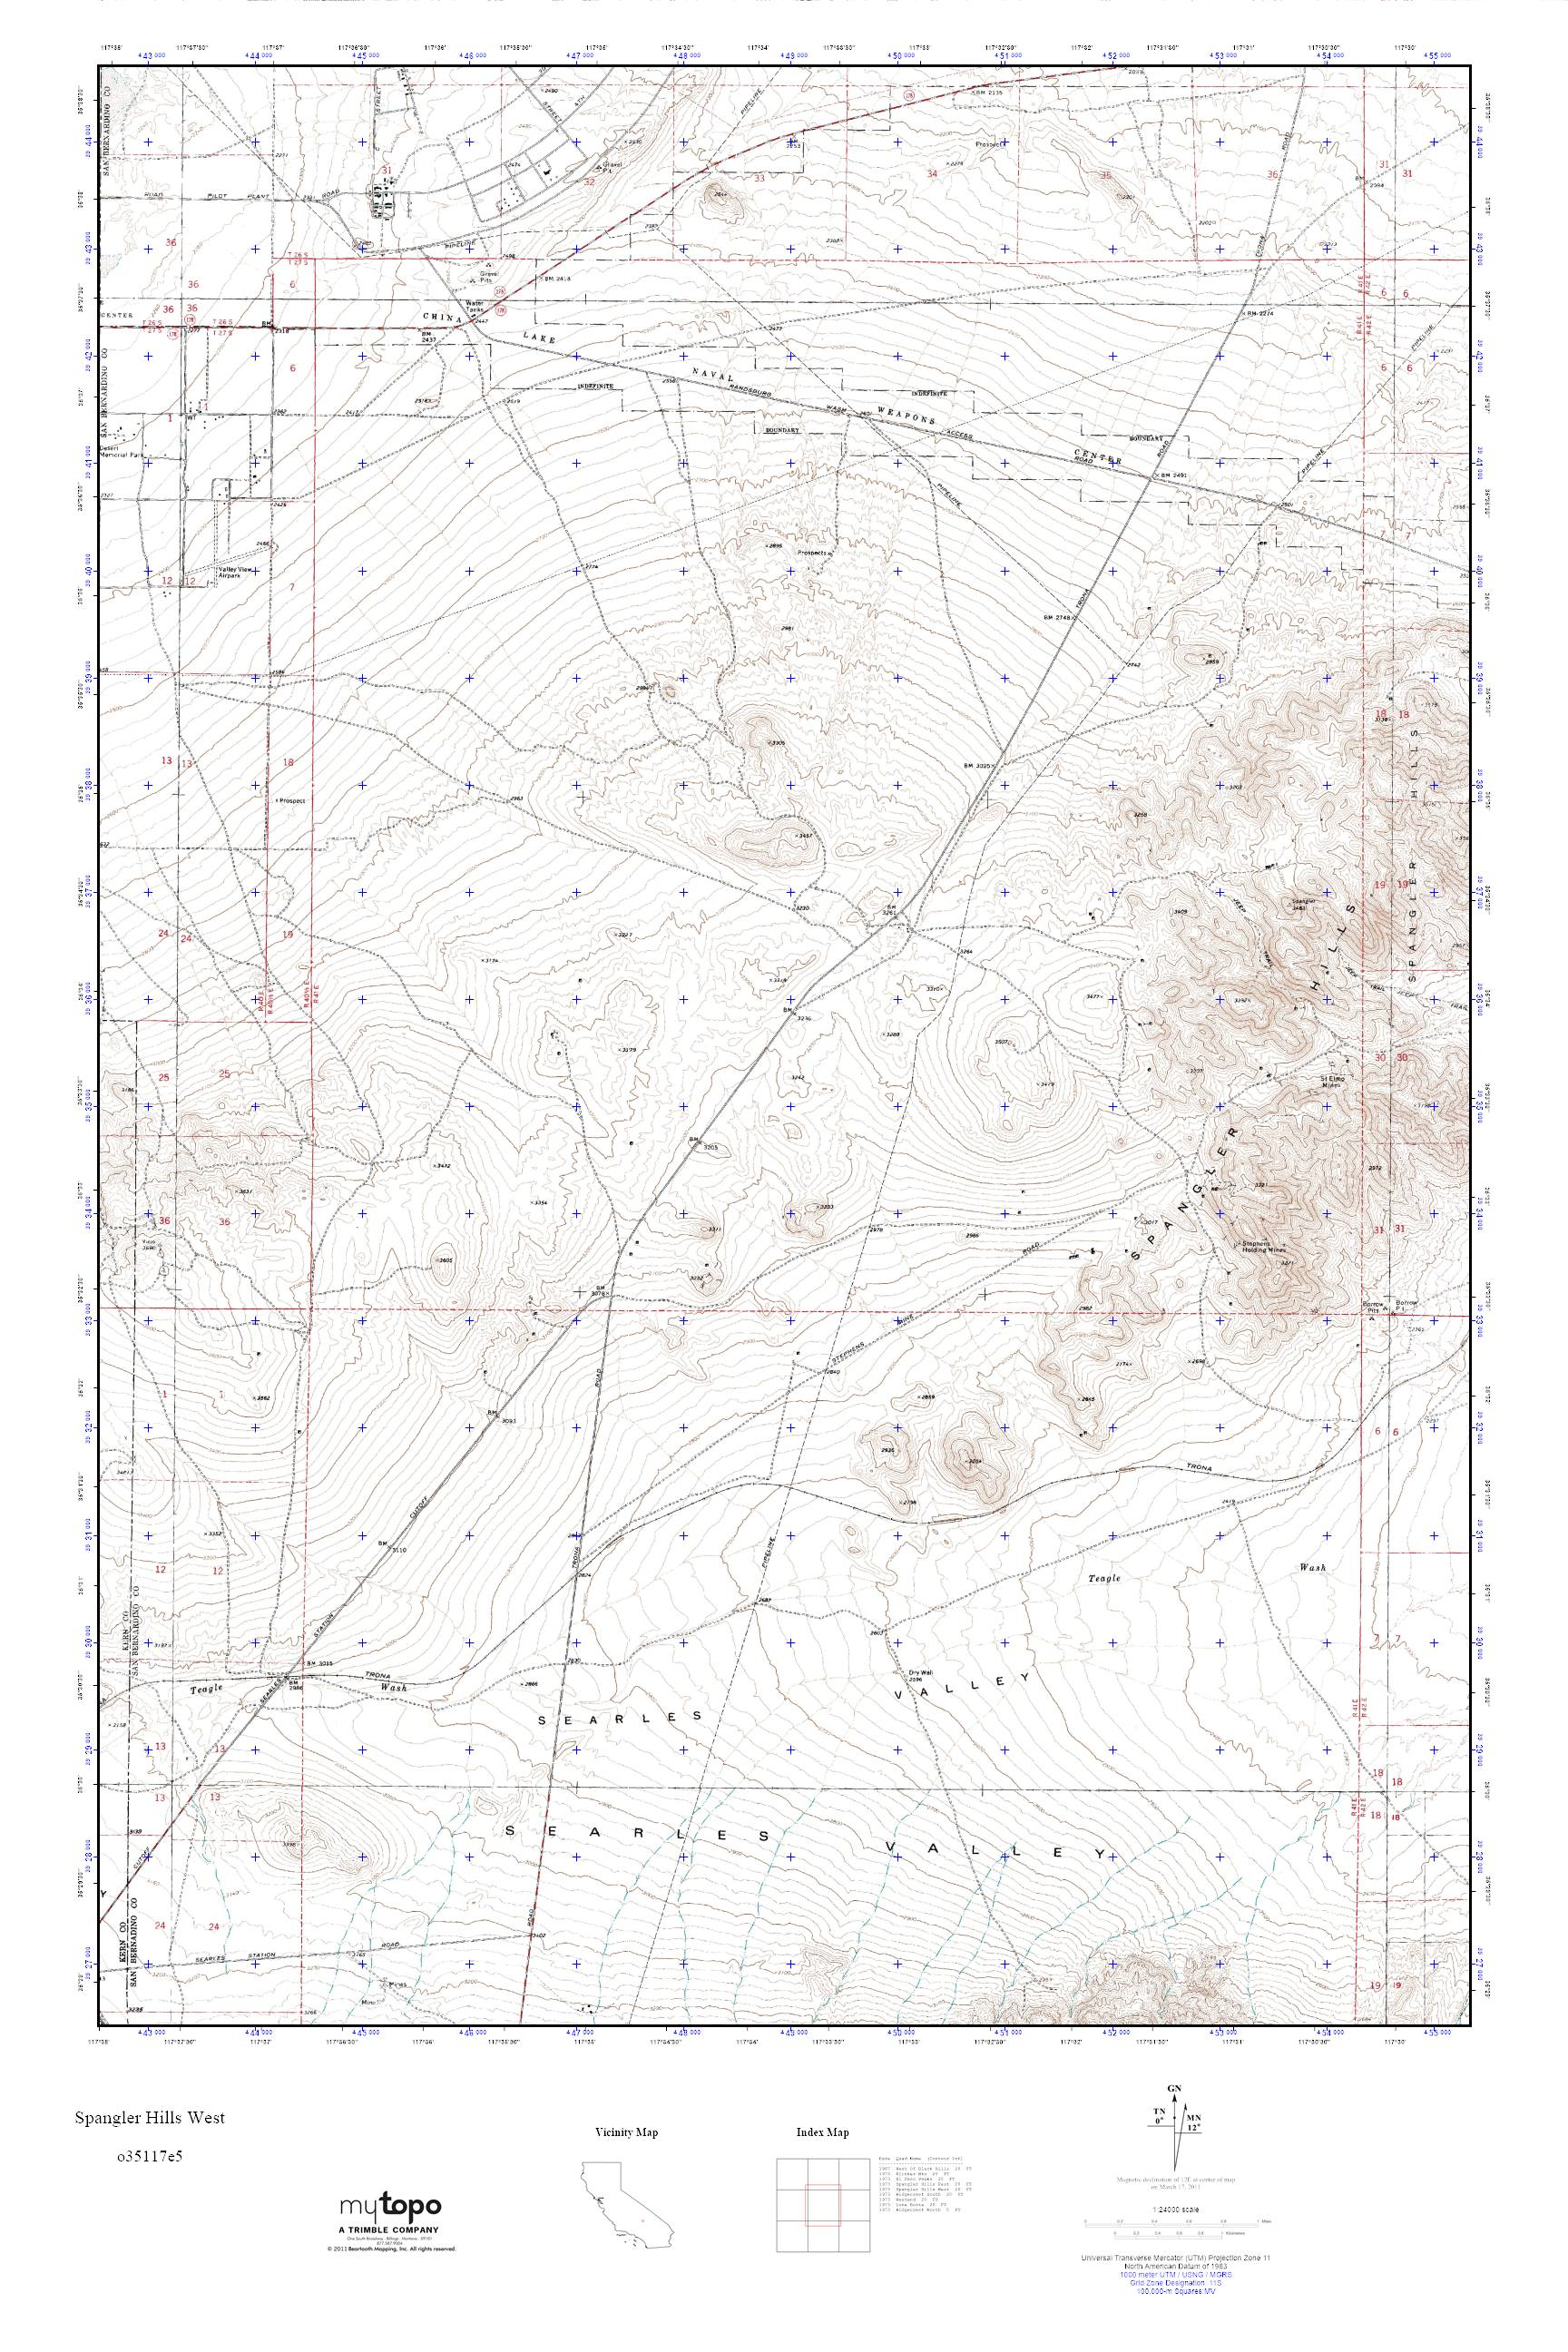 MyTopo Spangler Hills West, California USGS Quad Topo Map